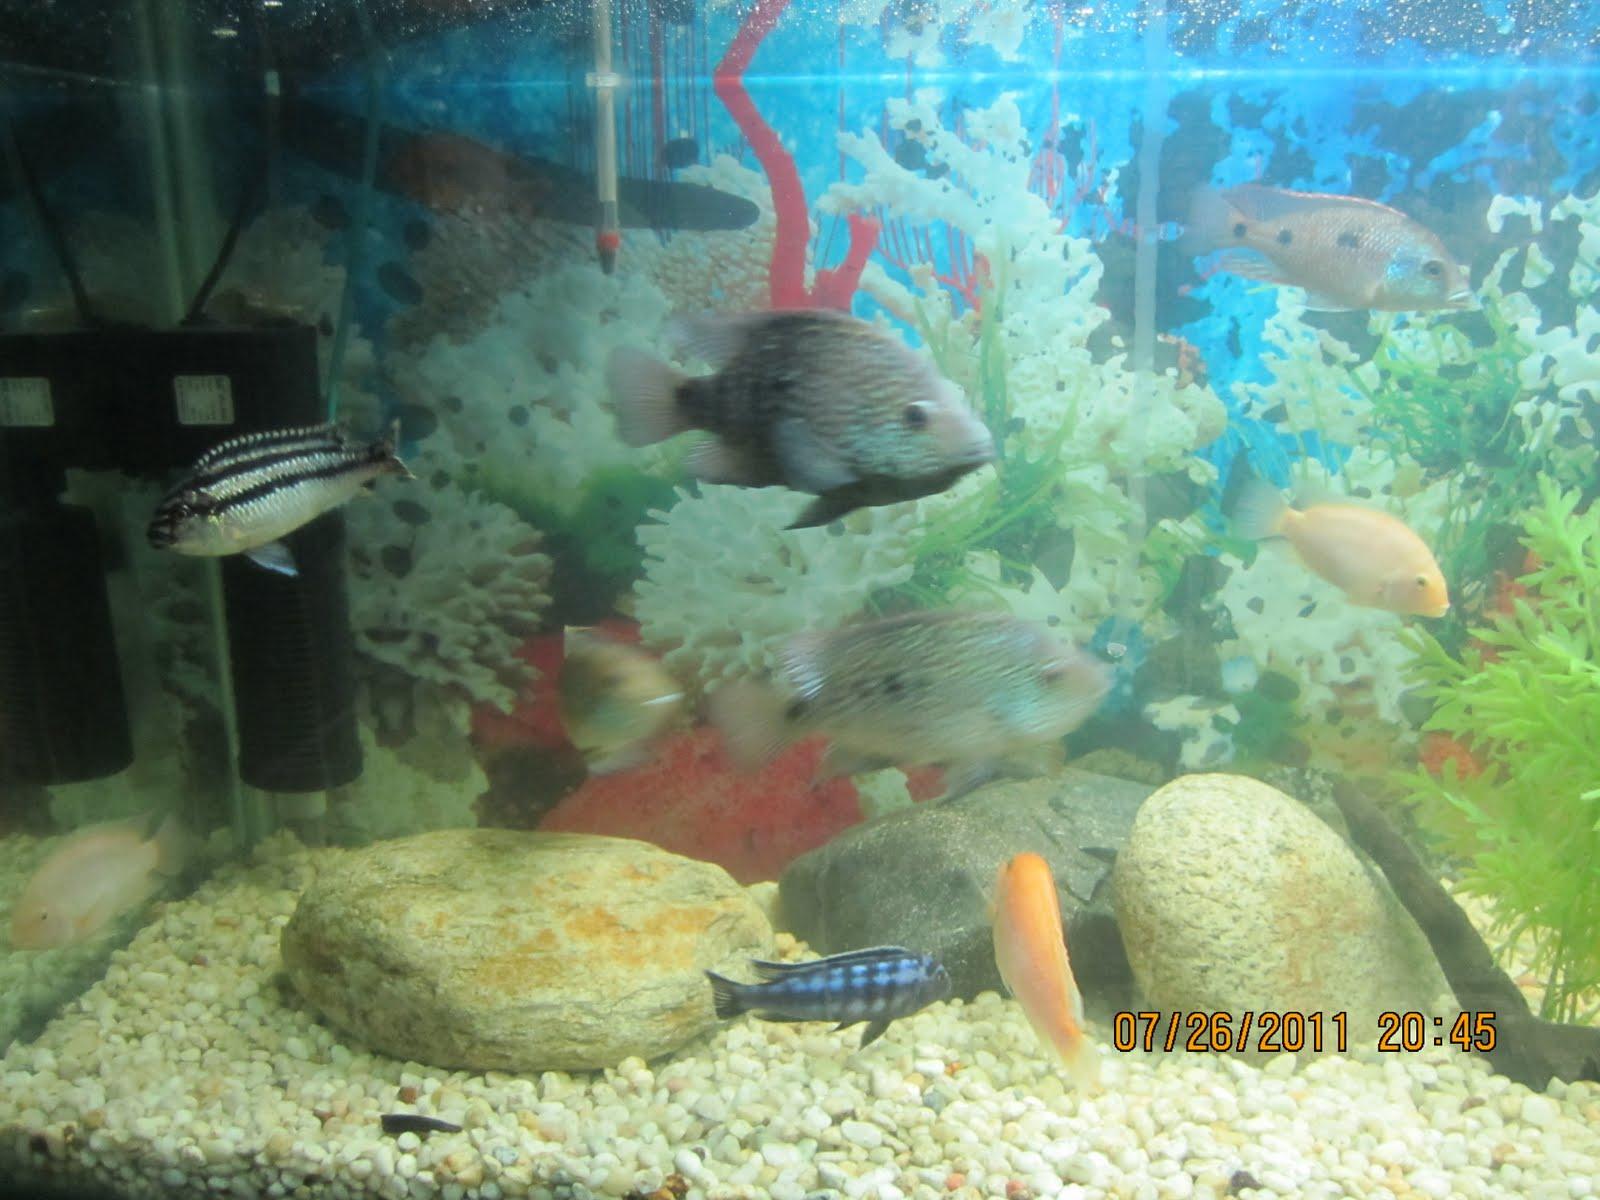 Acuicultura peces ornamentales agosto 2011 for Acuariofilia peces ornamentales